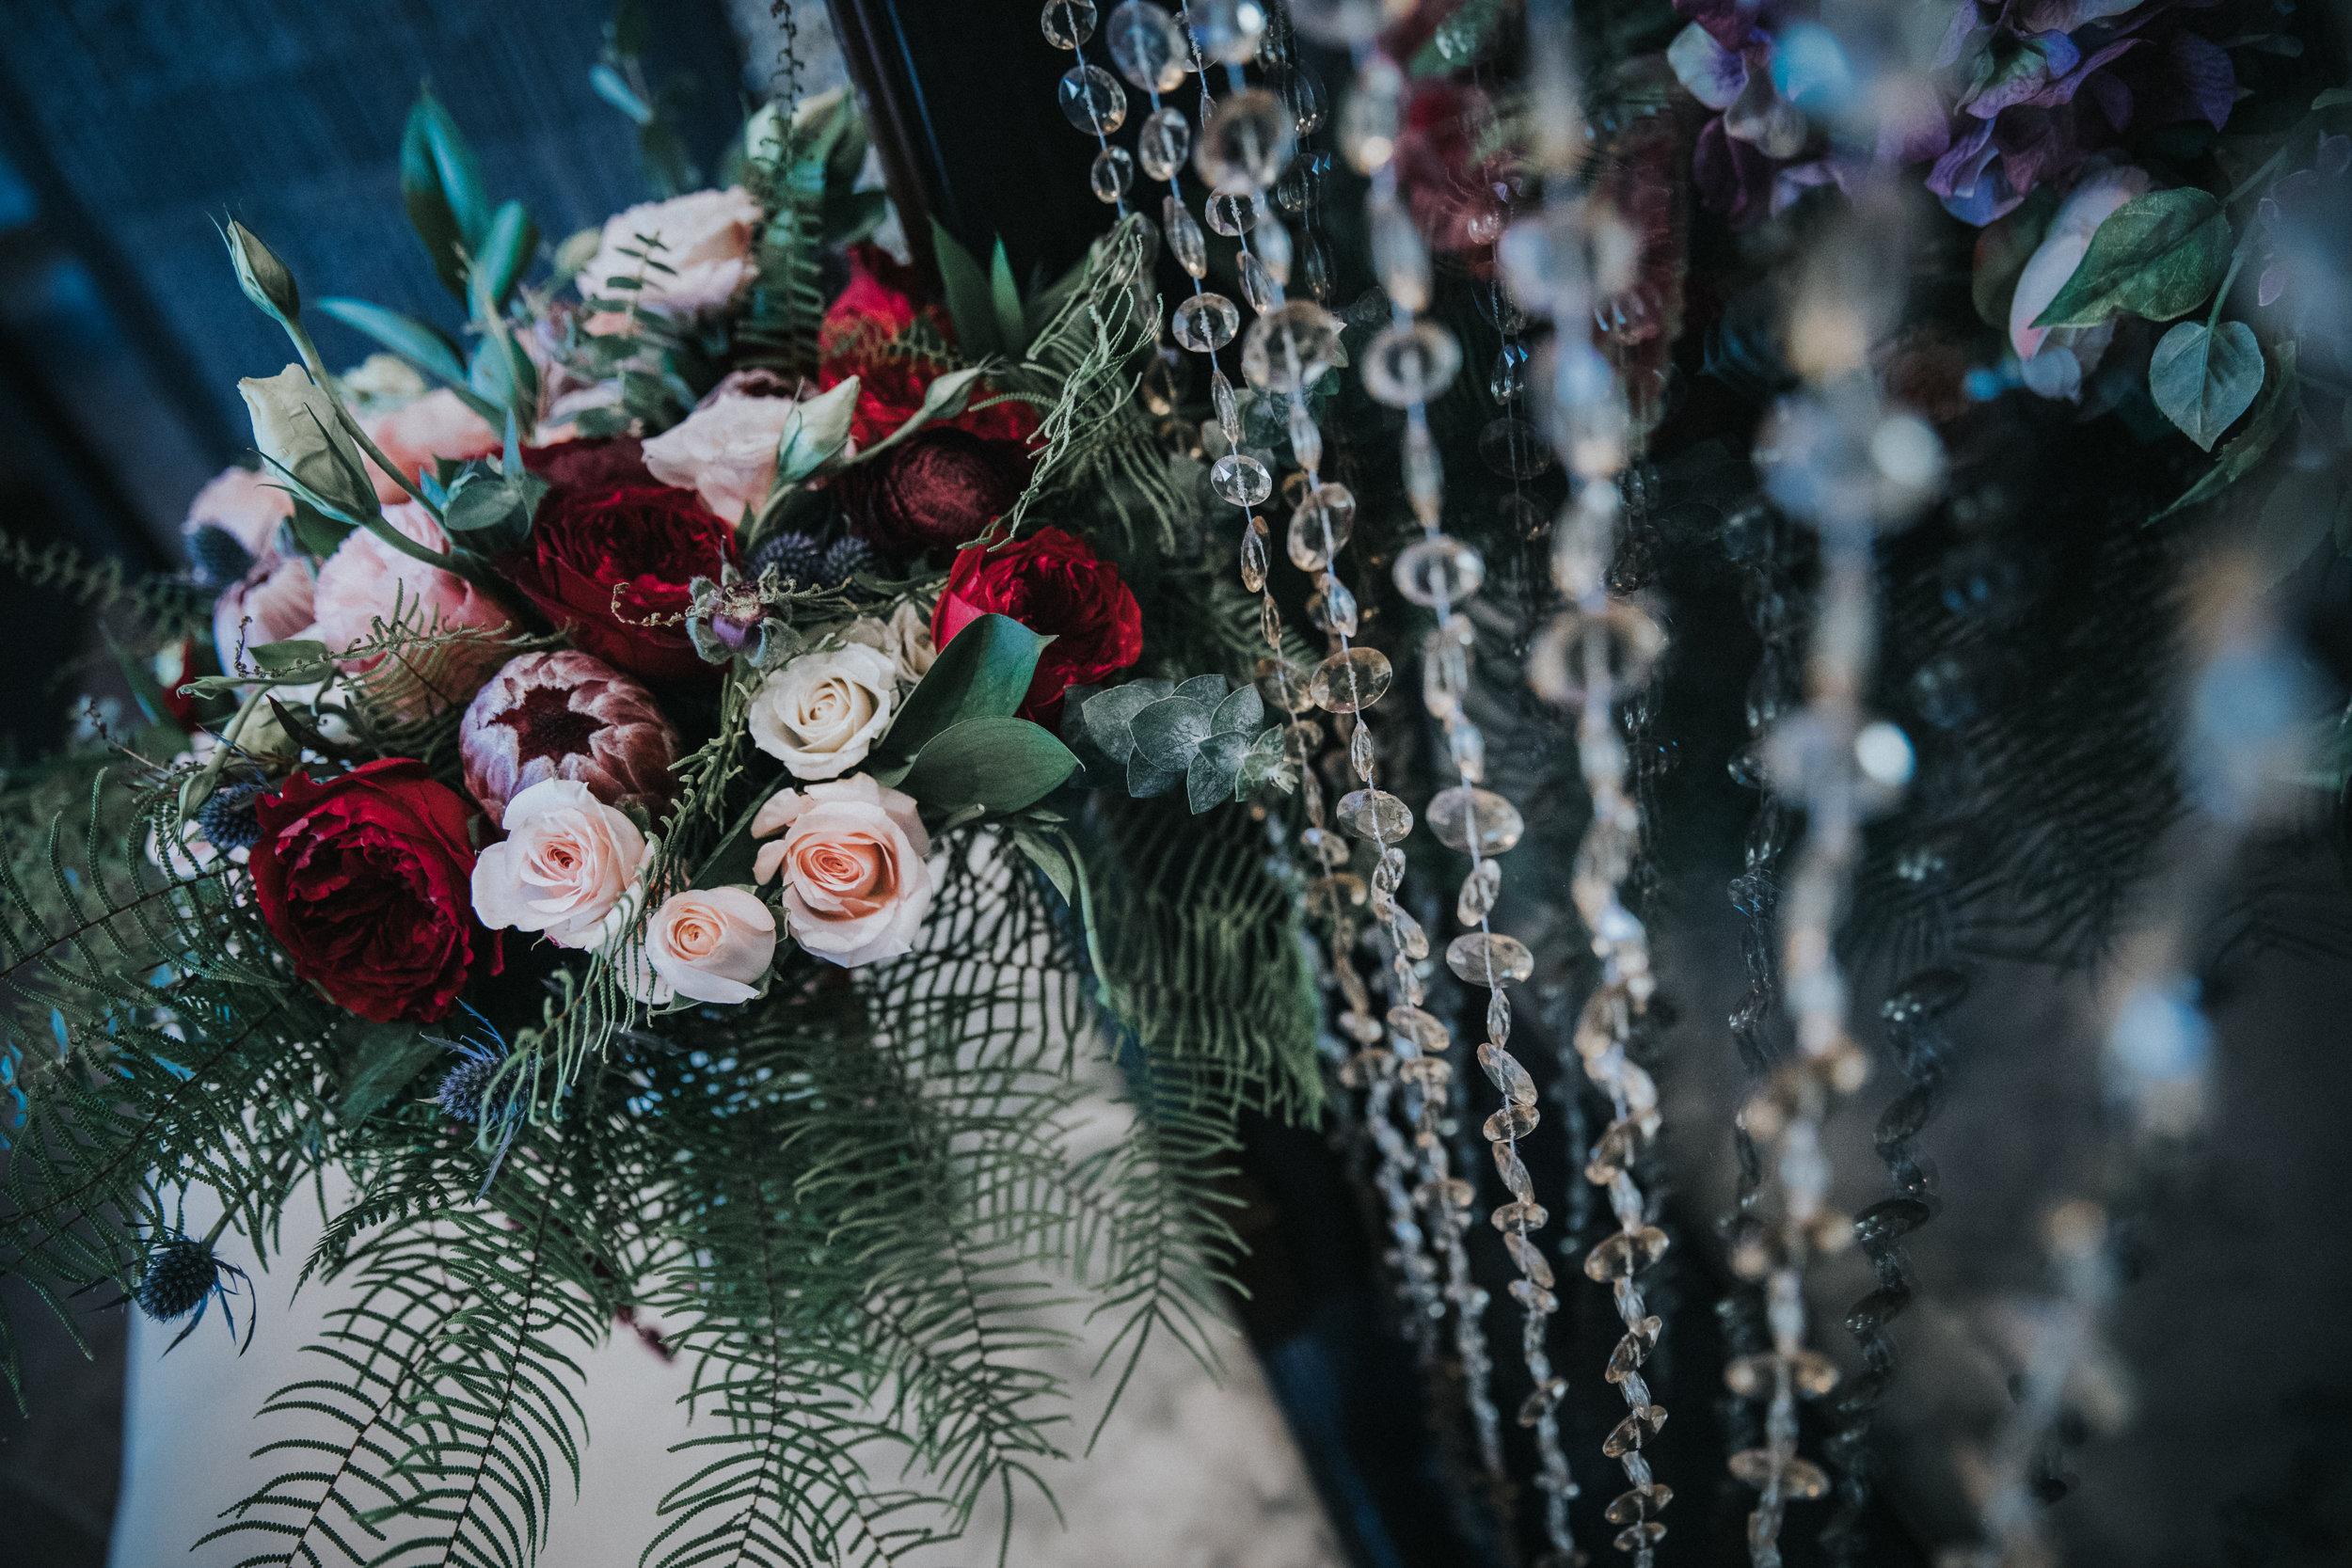 New-Jersey-Wedding-Photographer-ReceptionCenter-Valeria&Mike-Venue_Details (5 of 21).jpg